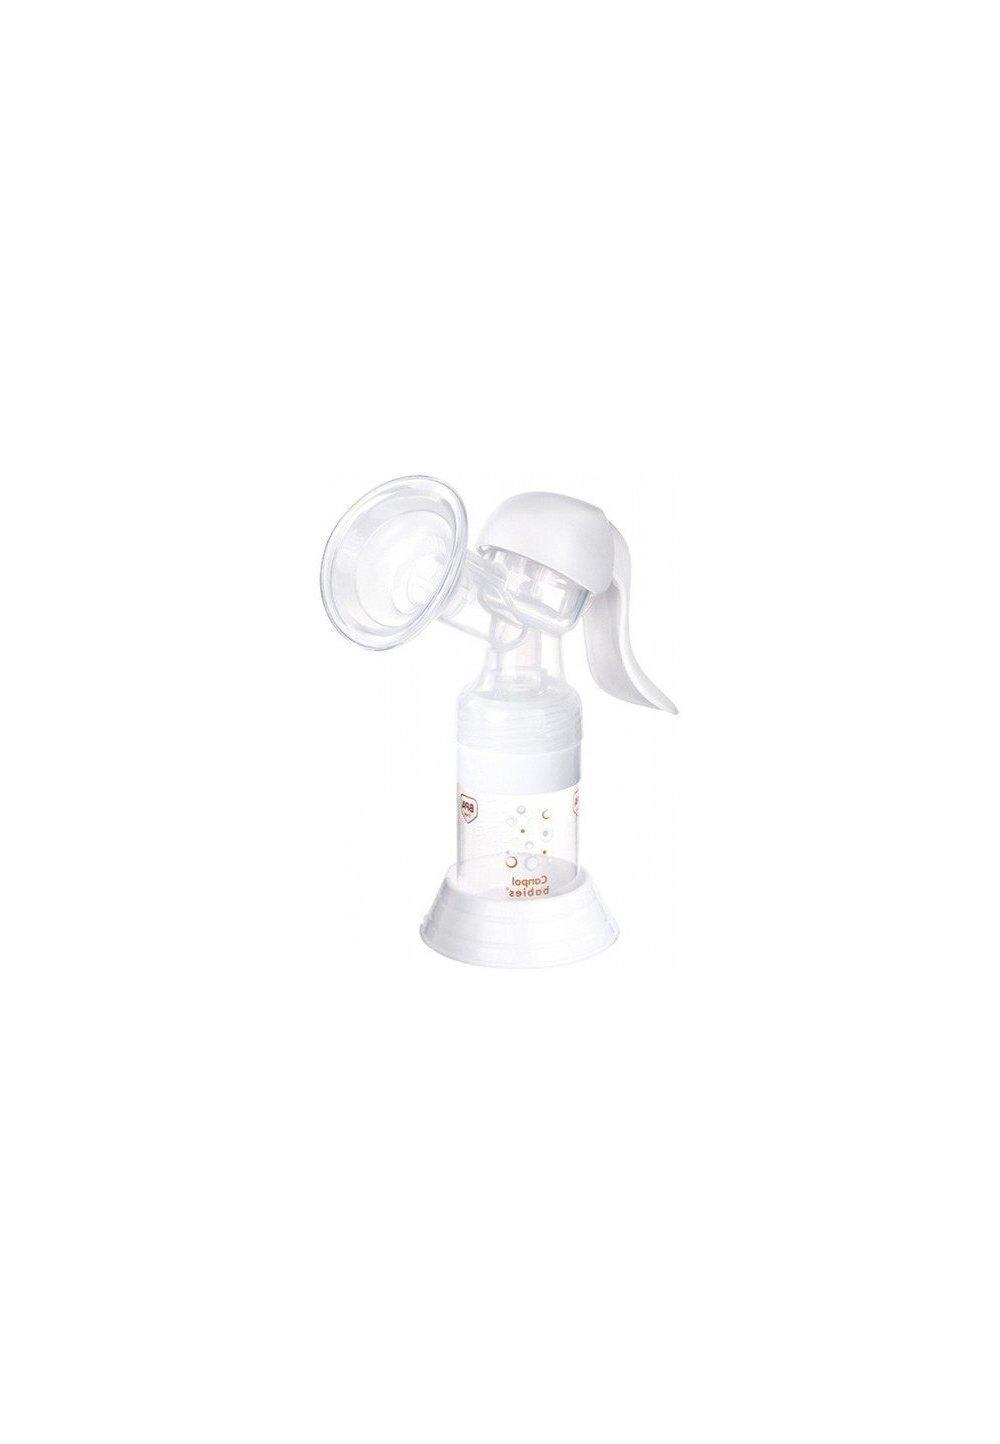 Pompa manuala de san, Canpol, Basic imagine